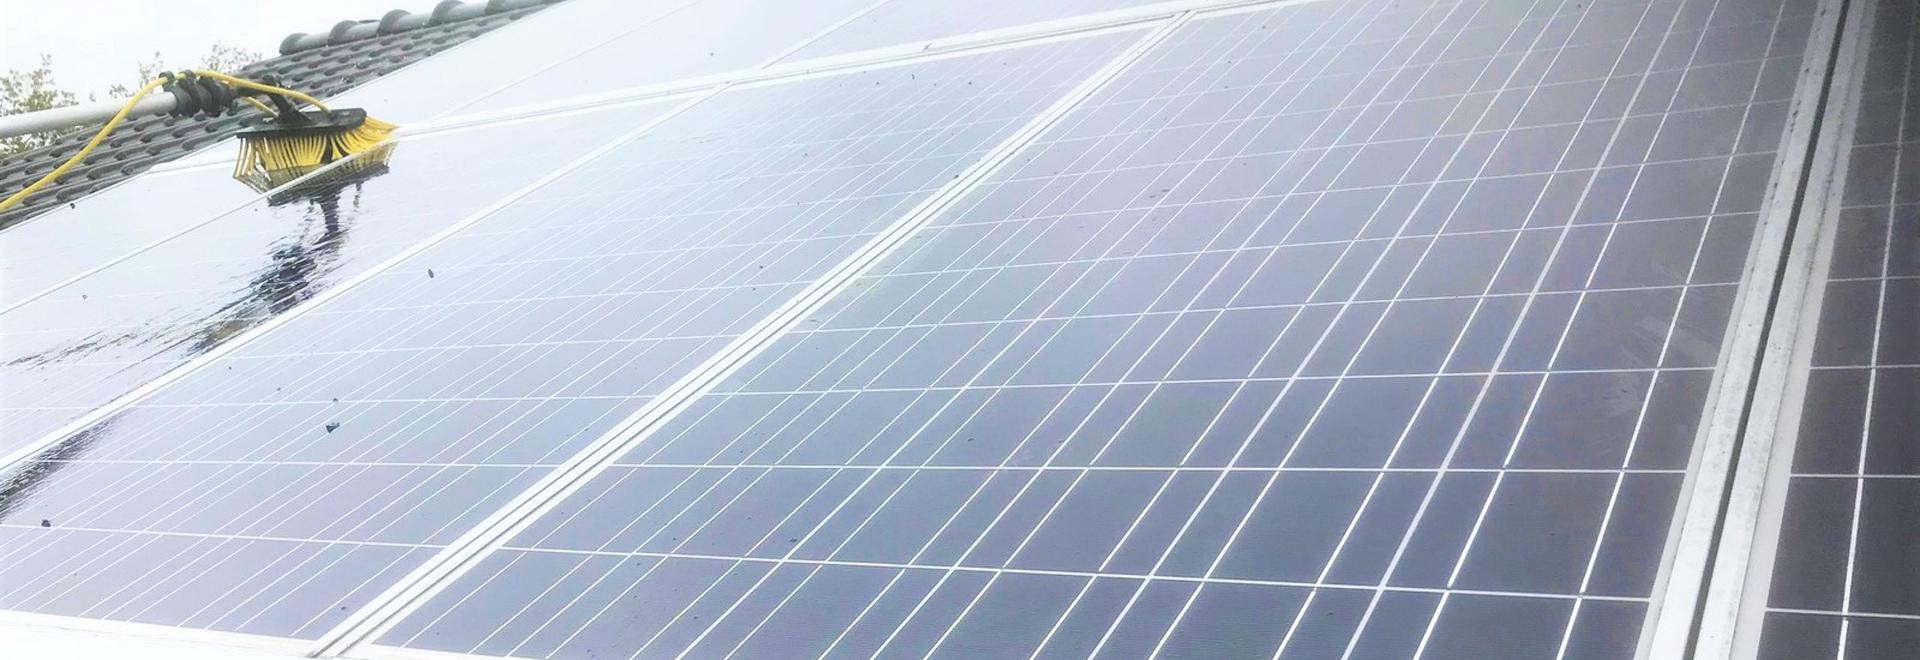 ecotrading-cleaning-zonnepanelen-reinigen-banner-2